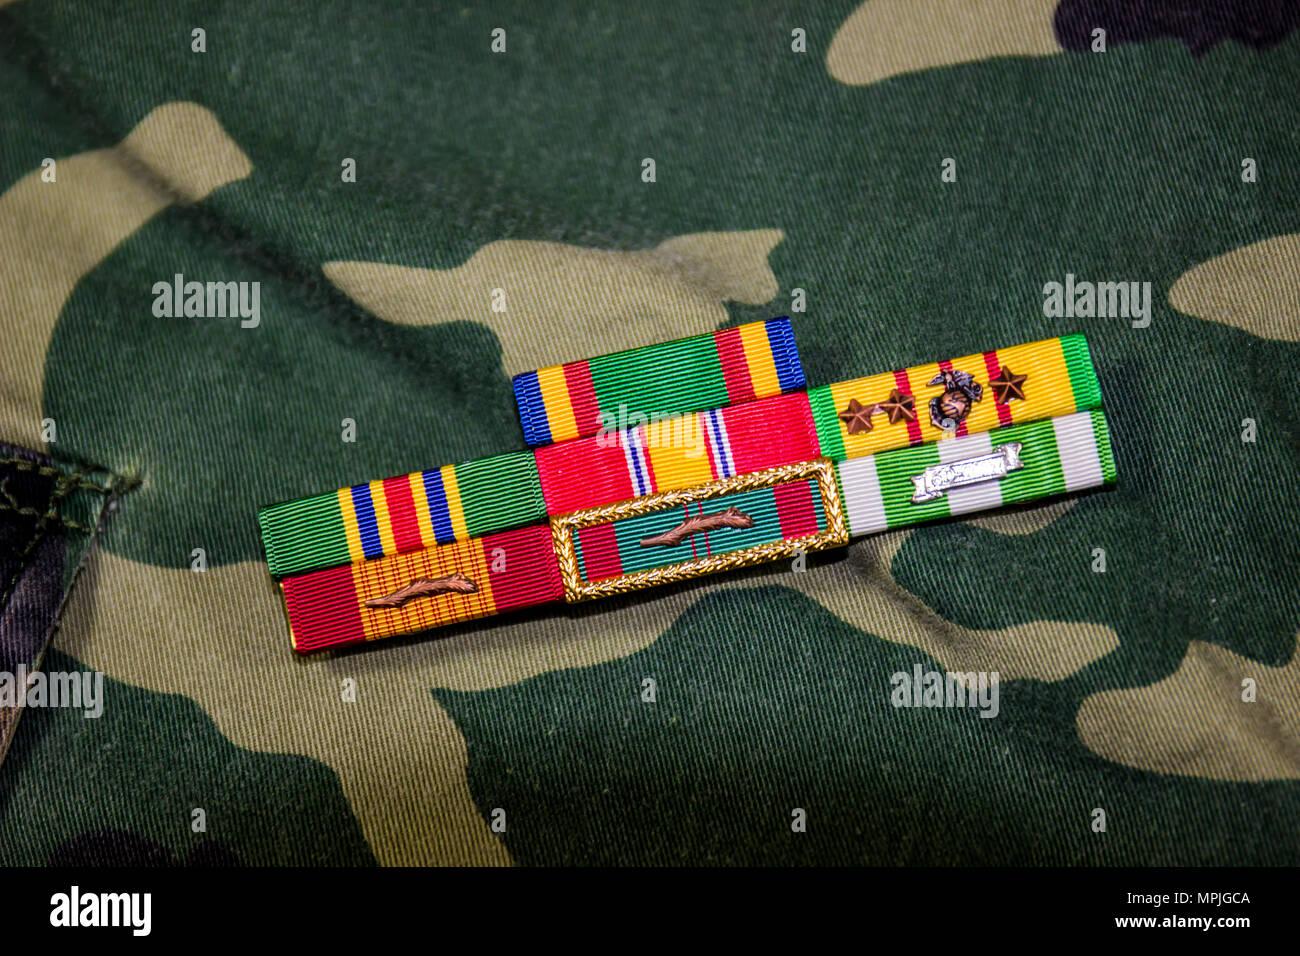 Vietnam Veteran Ribbons On Camouflage Uniform - Stock Image